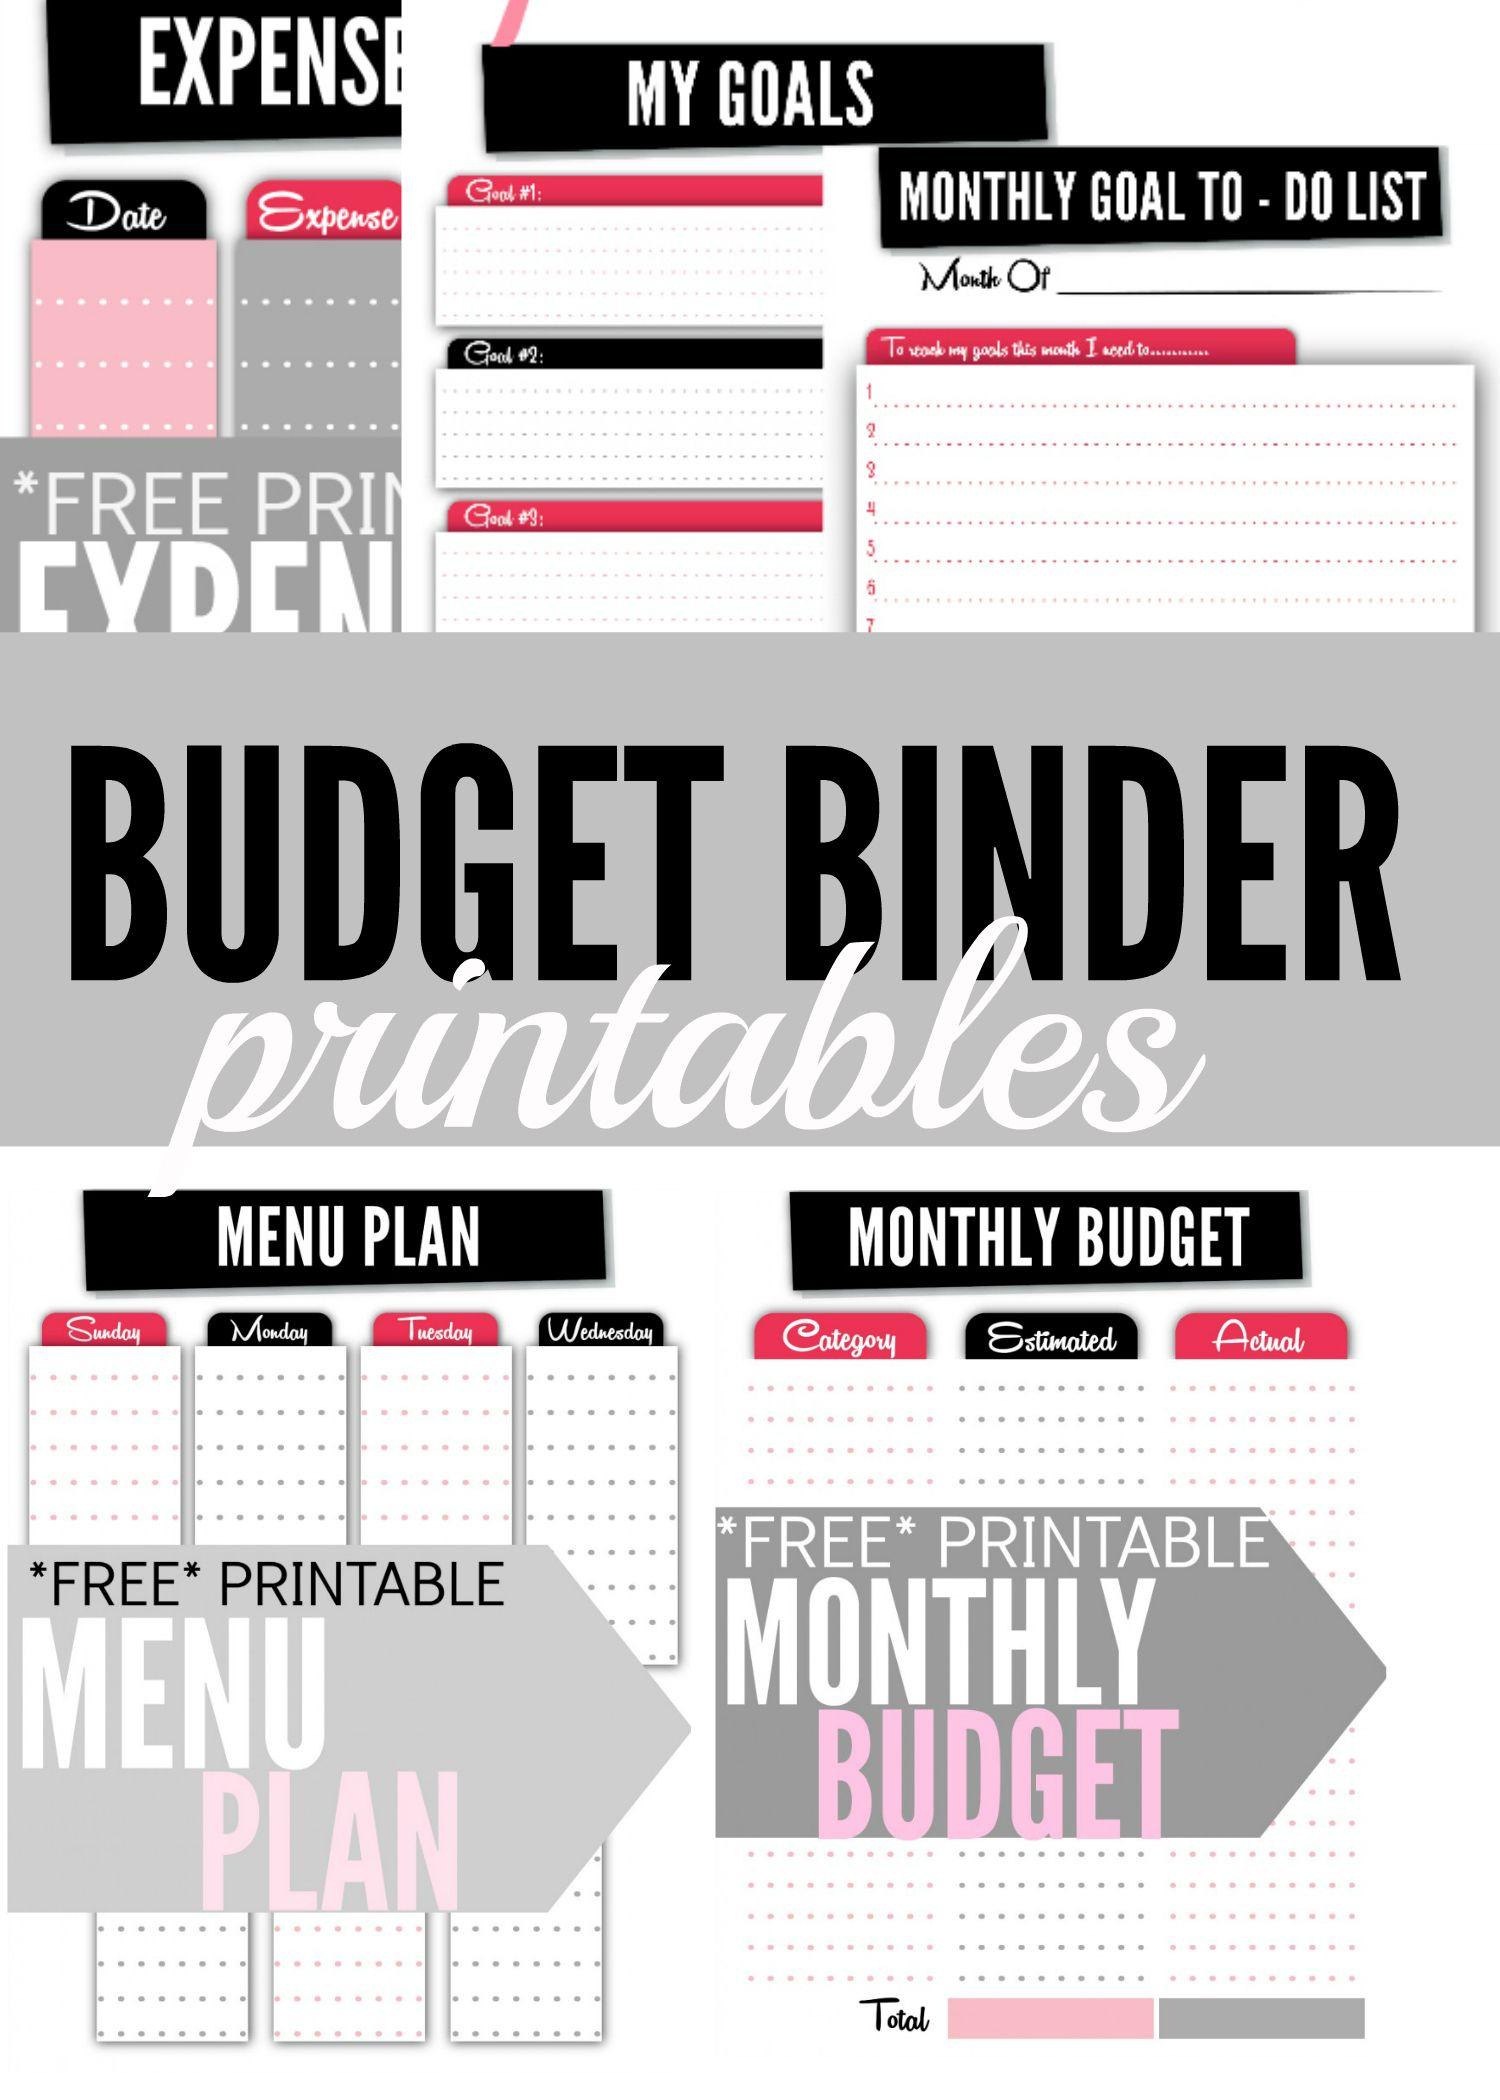 Budget Binder Printables | Thrifty Thursday @ Lwsl | Pinterest - Free Printable Budget Binder